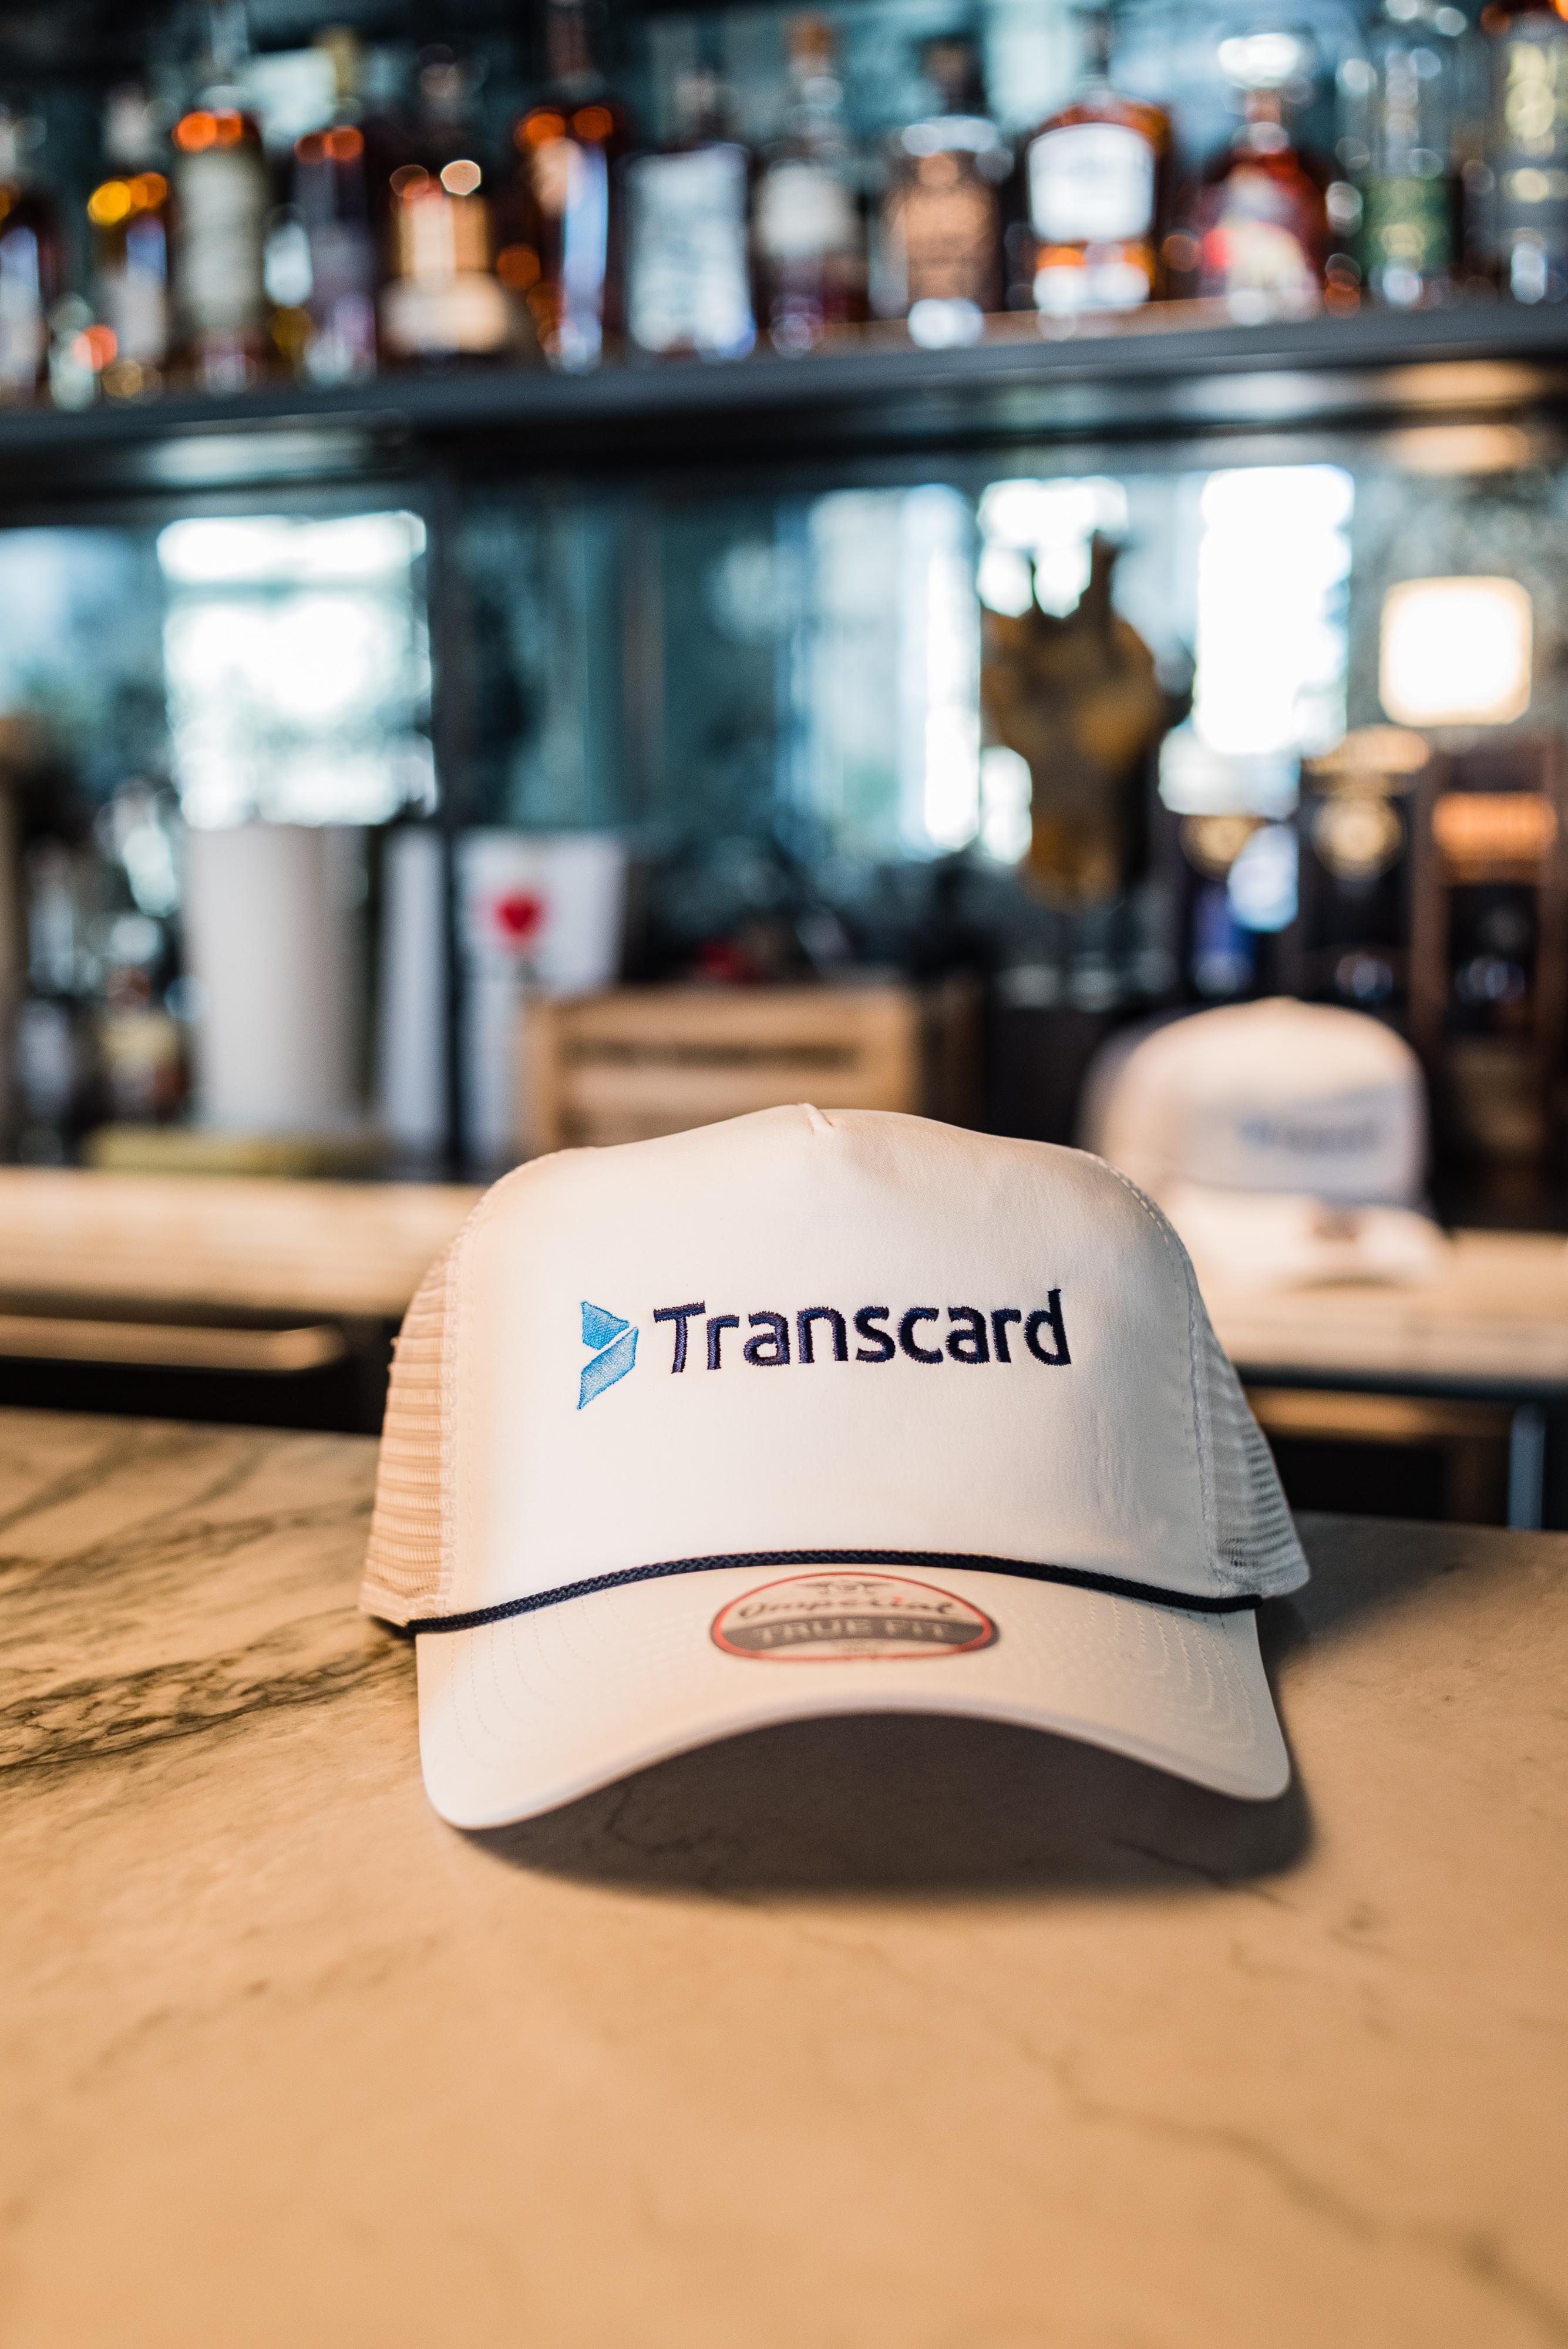 70-transcard-ribbon-cutting-event - Copy